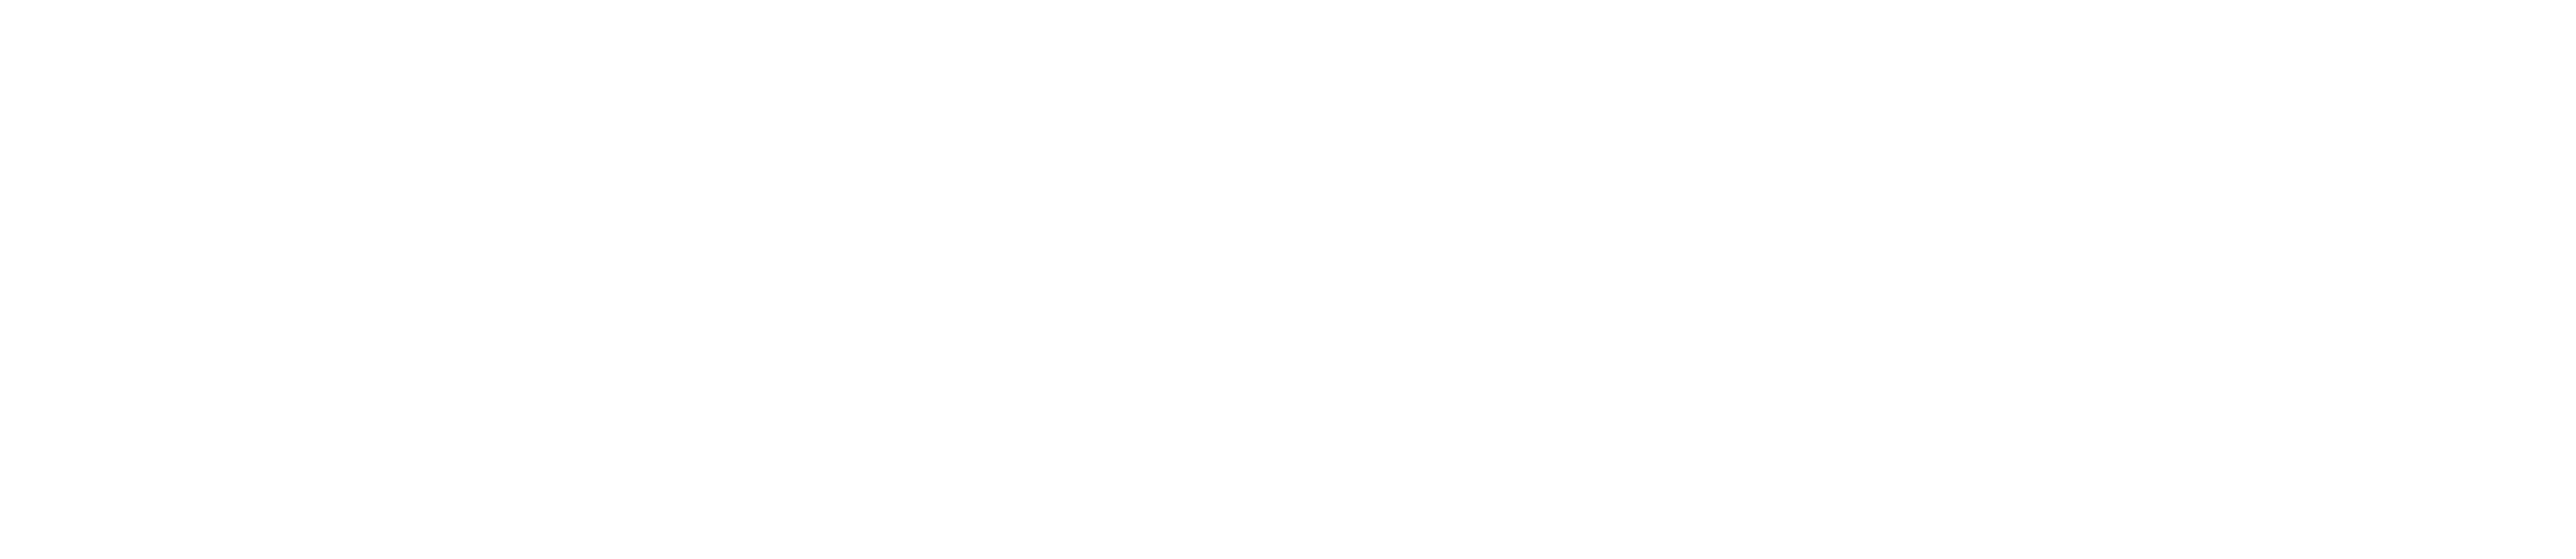 https://cdn.shortpixel.ai/client/q_lossy,ret_img,w_3573/https://suncountrymarinegroup.com/wp-content/uploads/2020/06/bennington-pontoon-logo-t.png